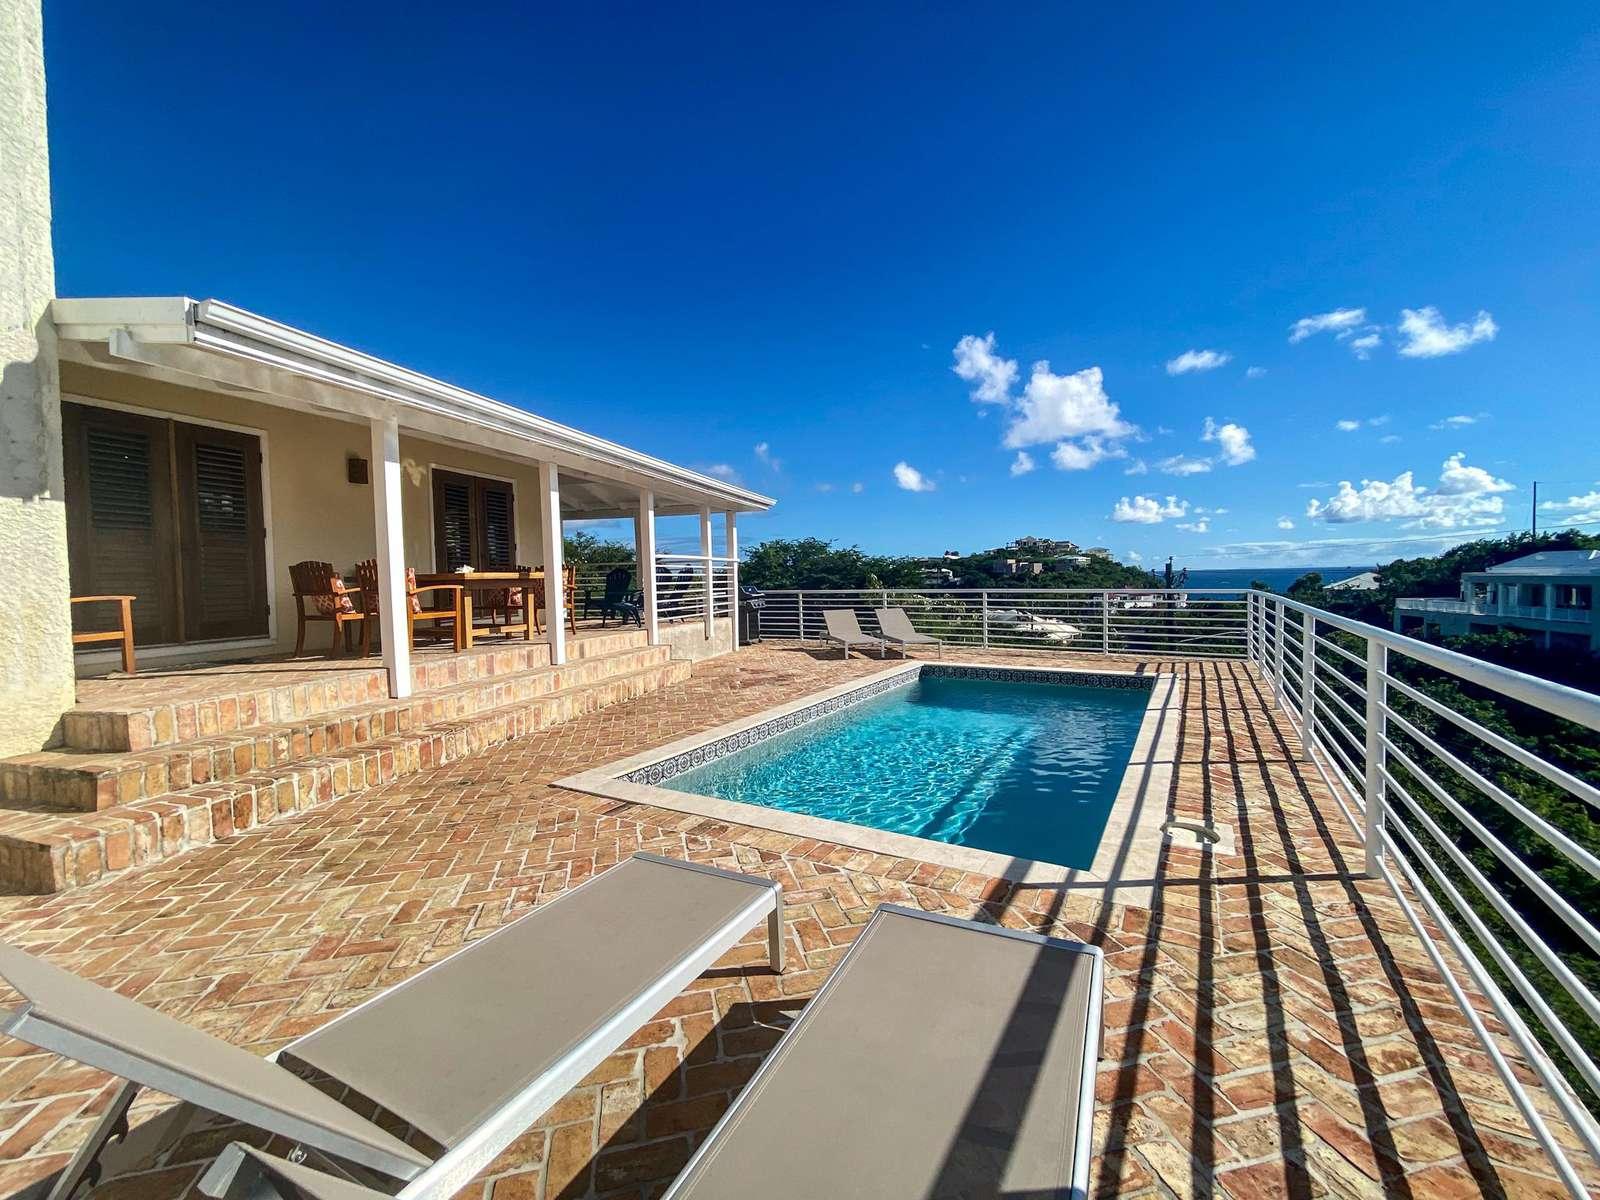 The spacious pool deck!